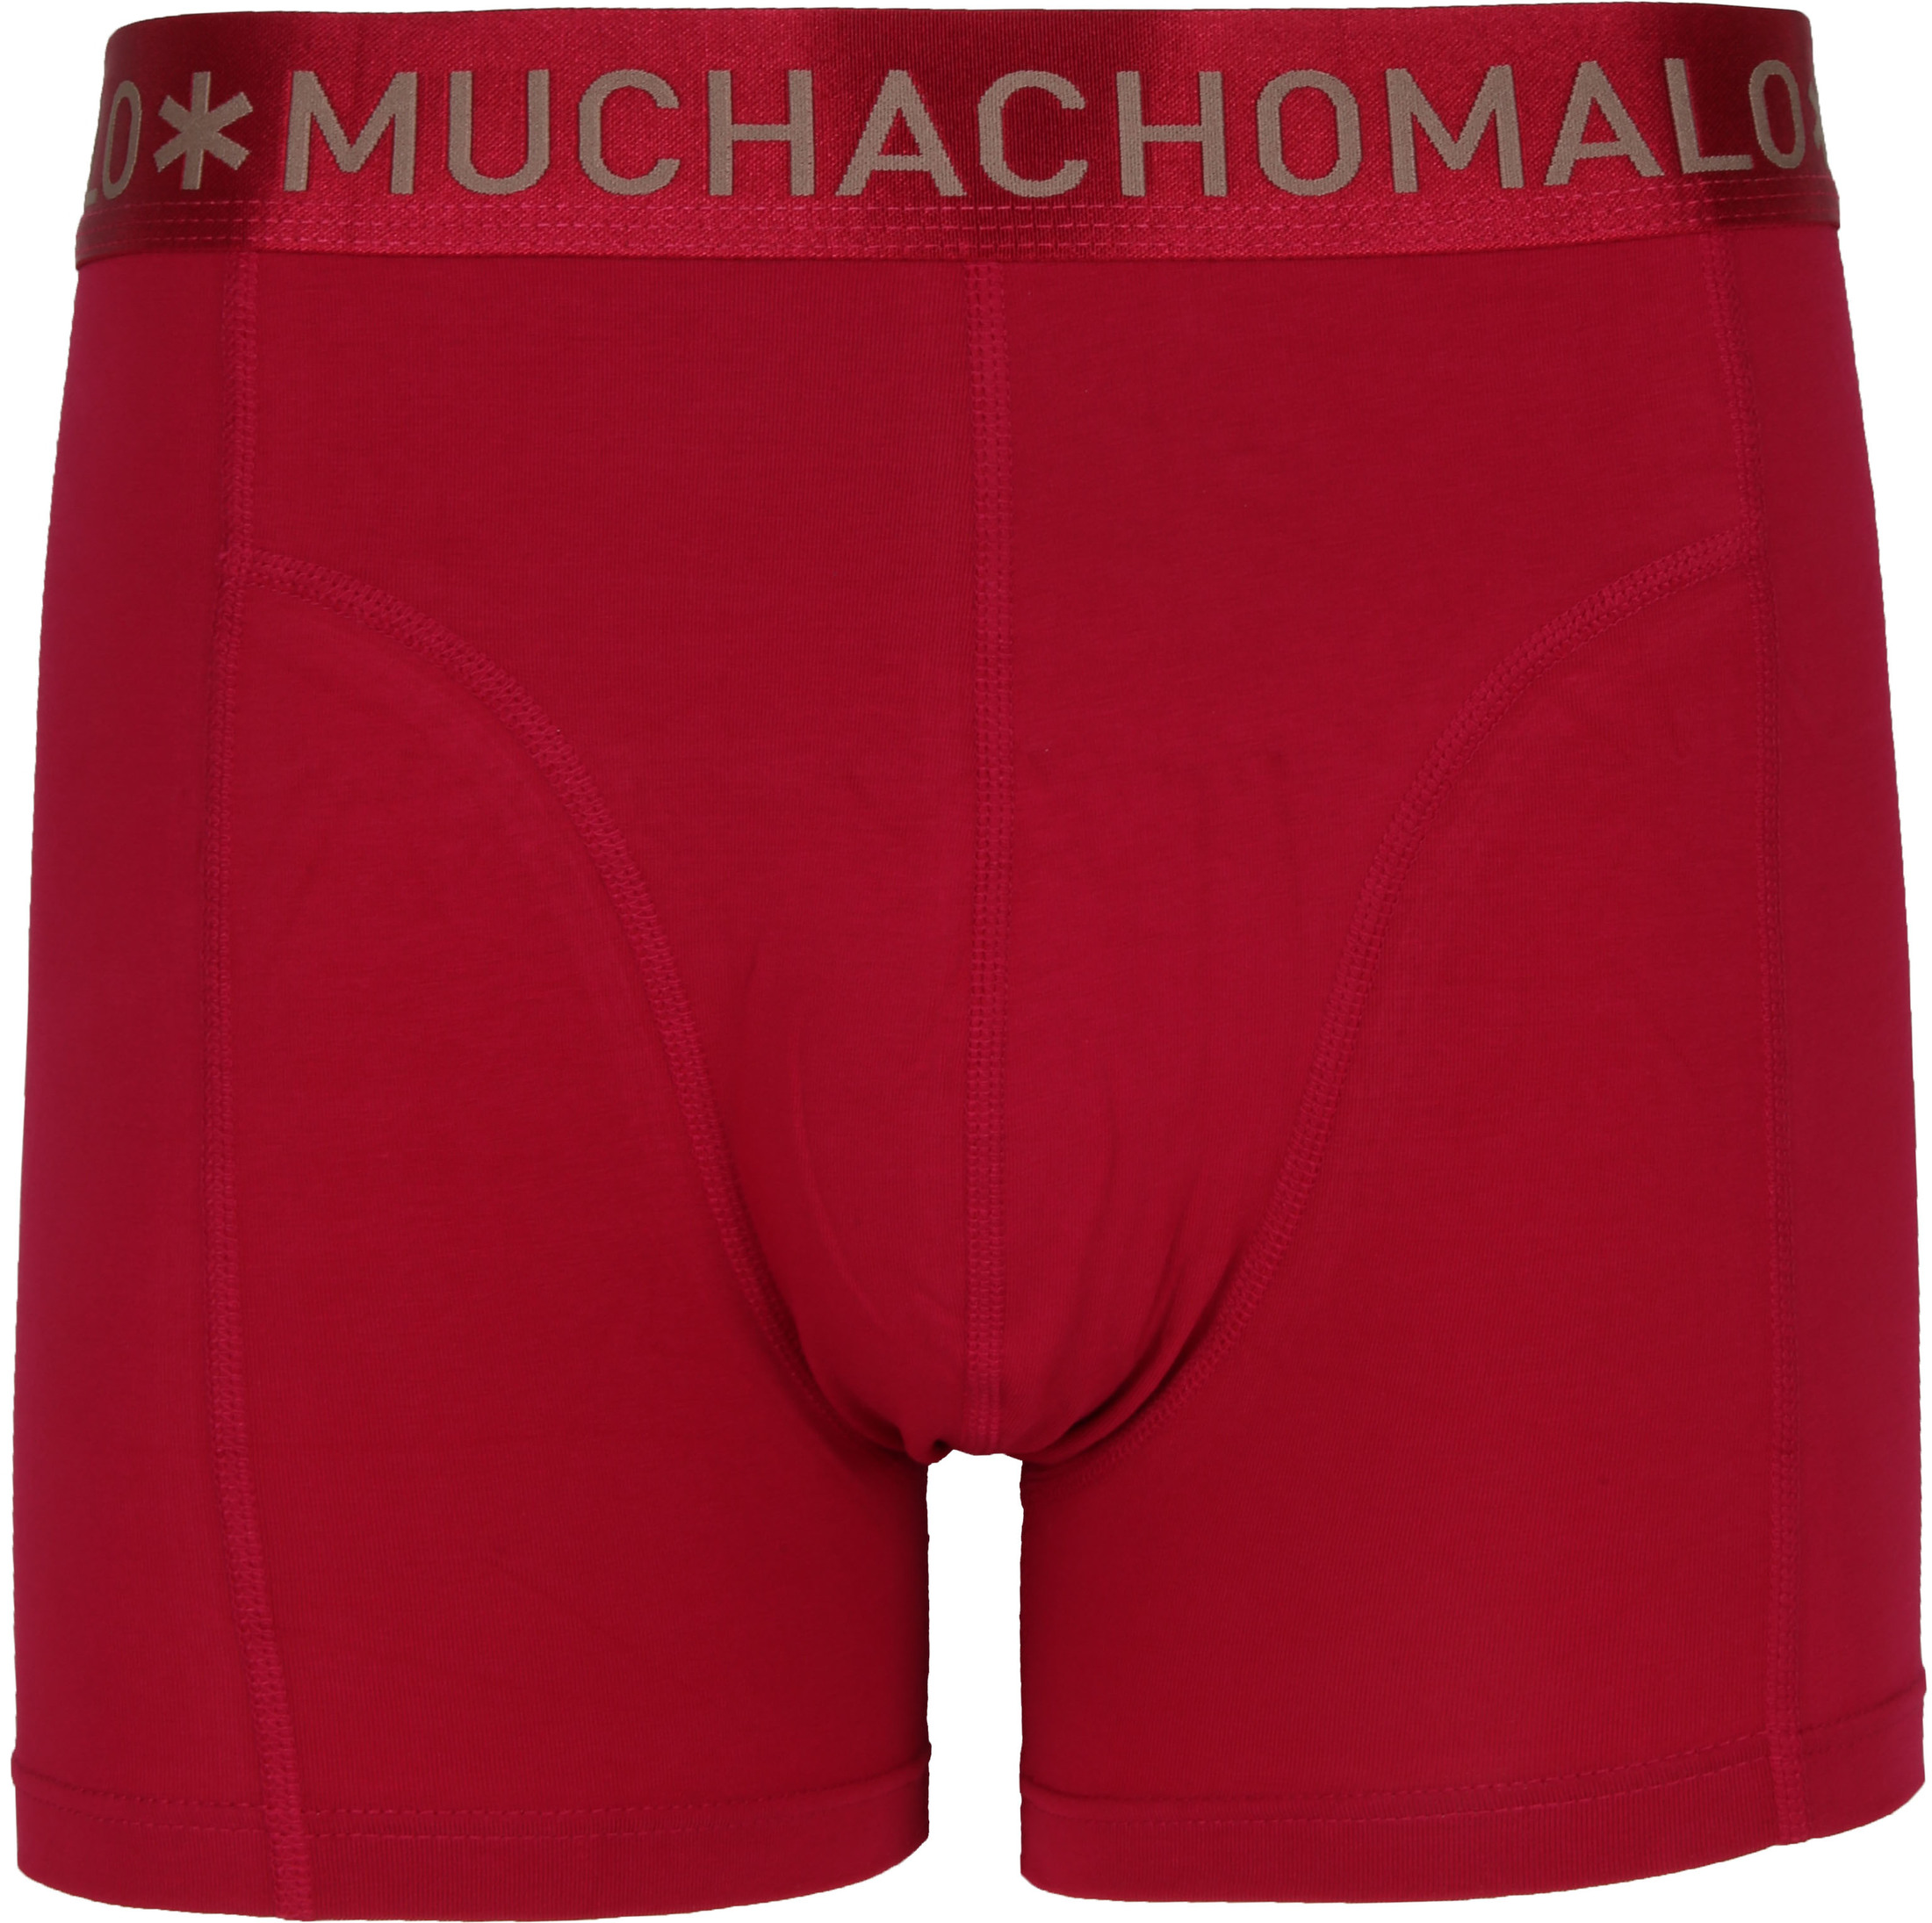 Muchachomalo Boxershort Gift Tube Rood